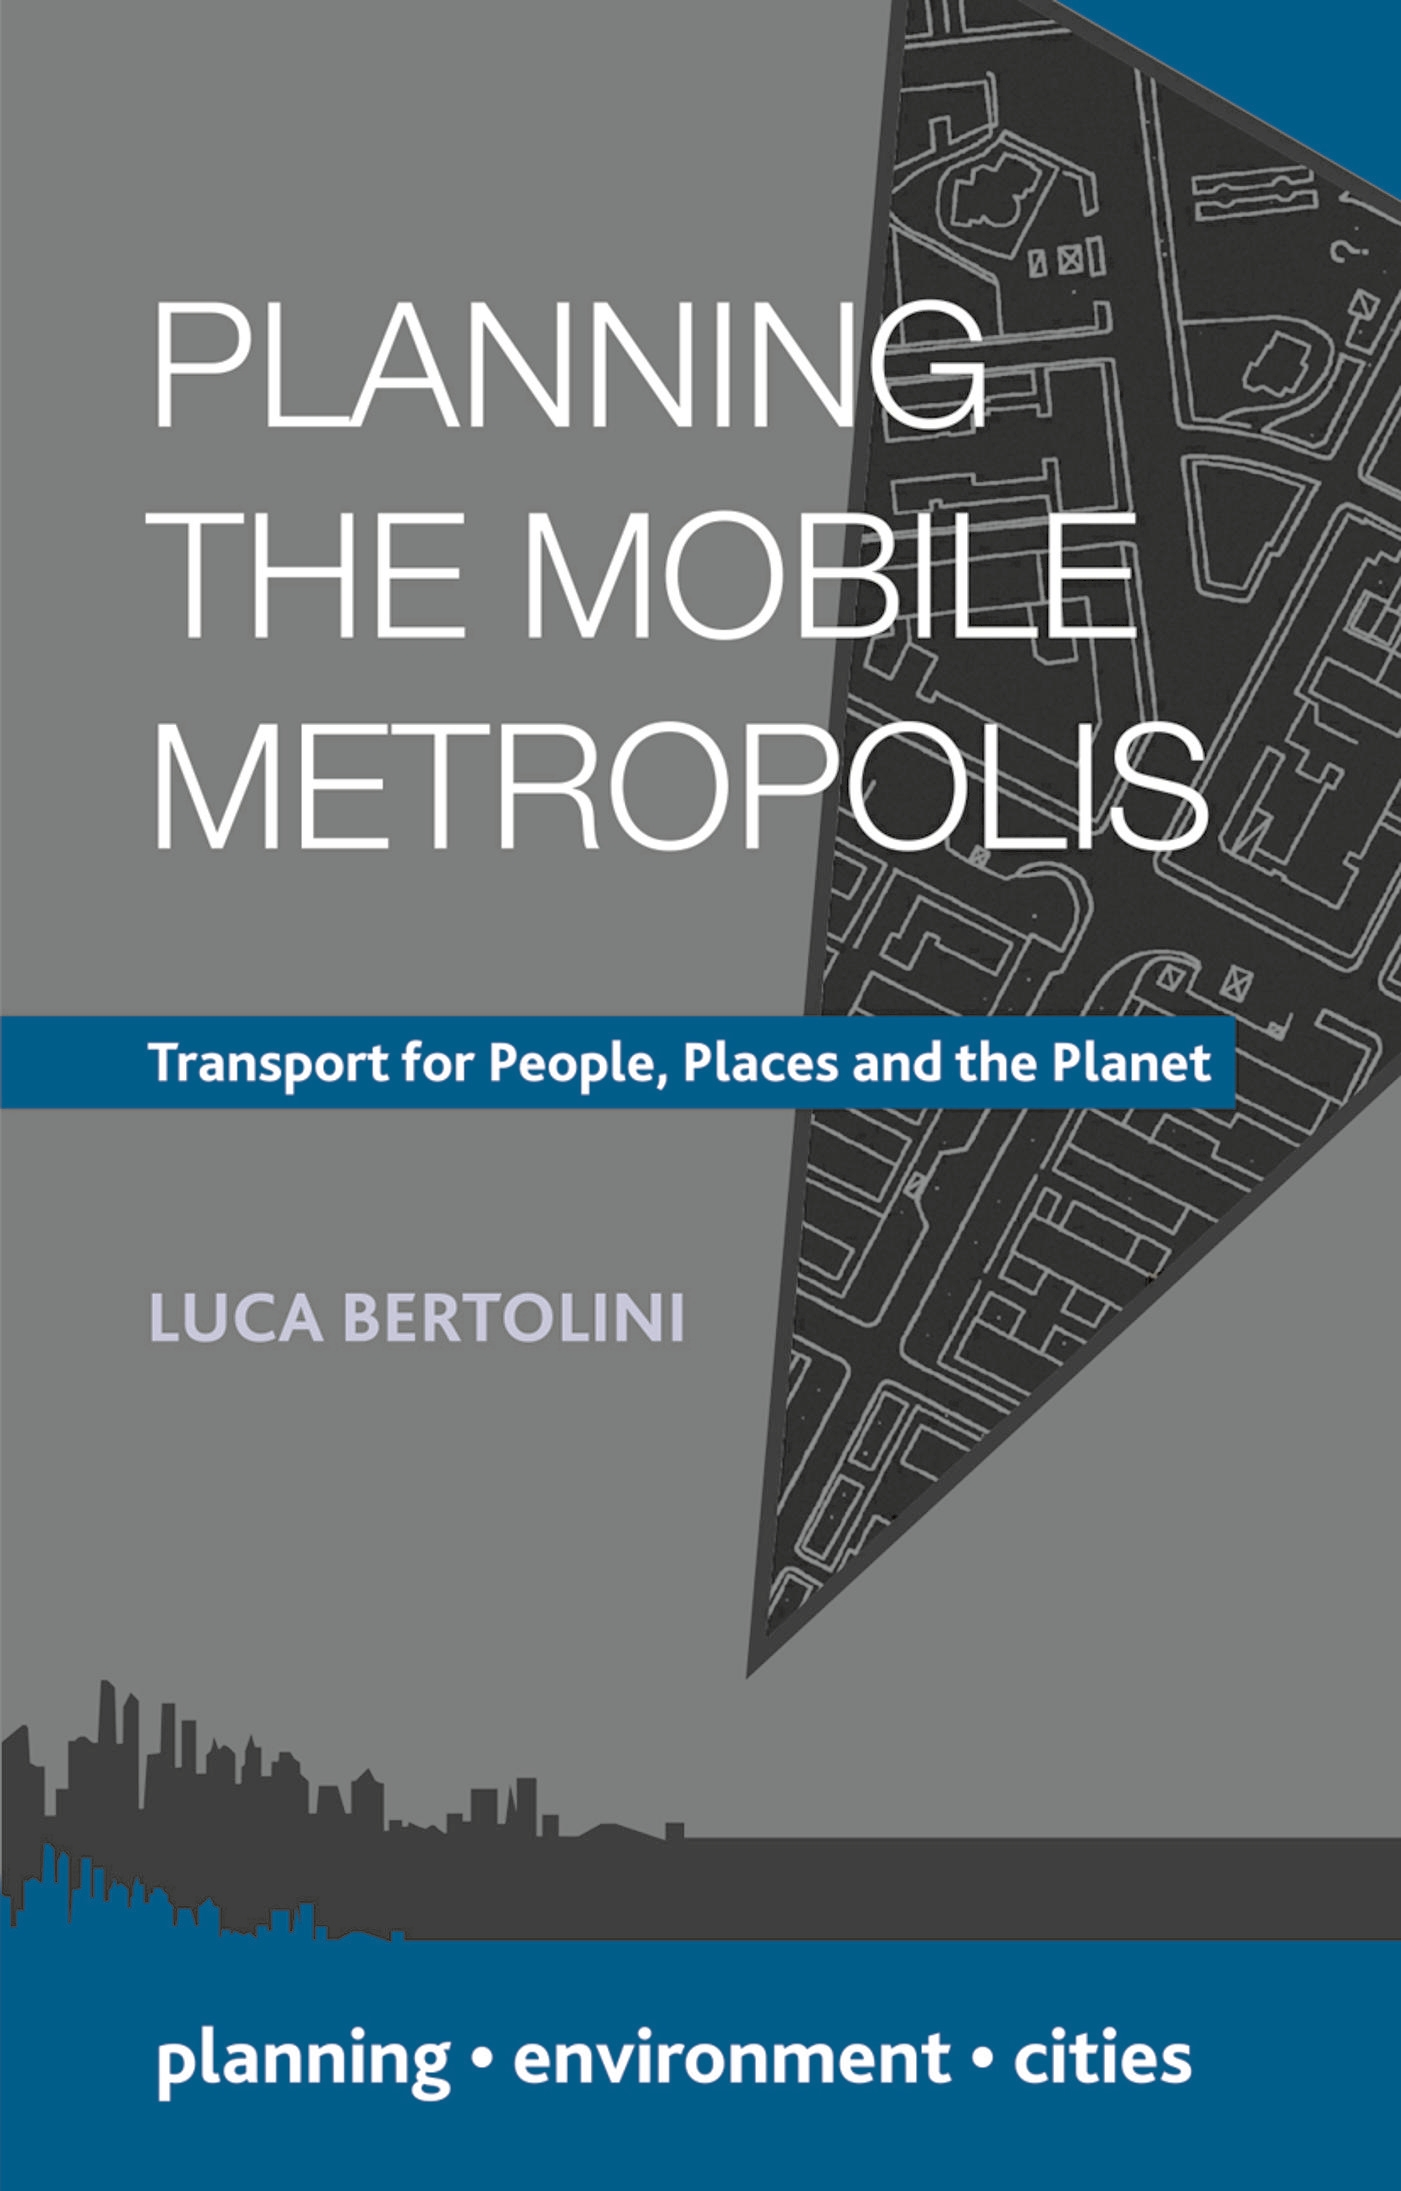 Planning the Mobile Metropolis